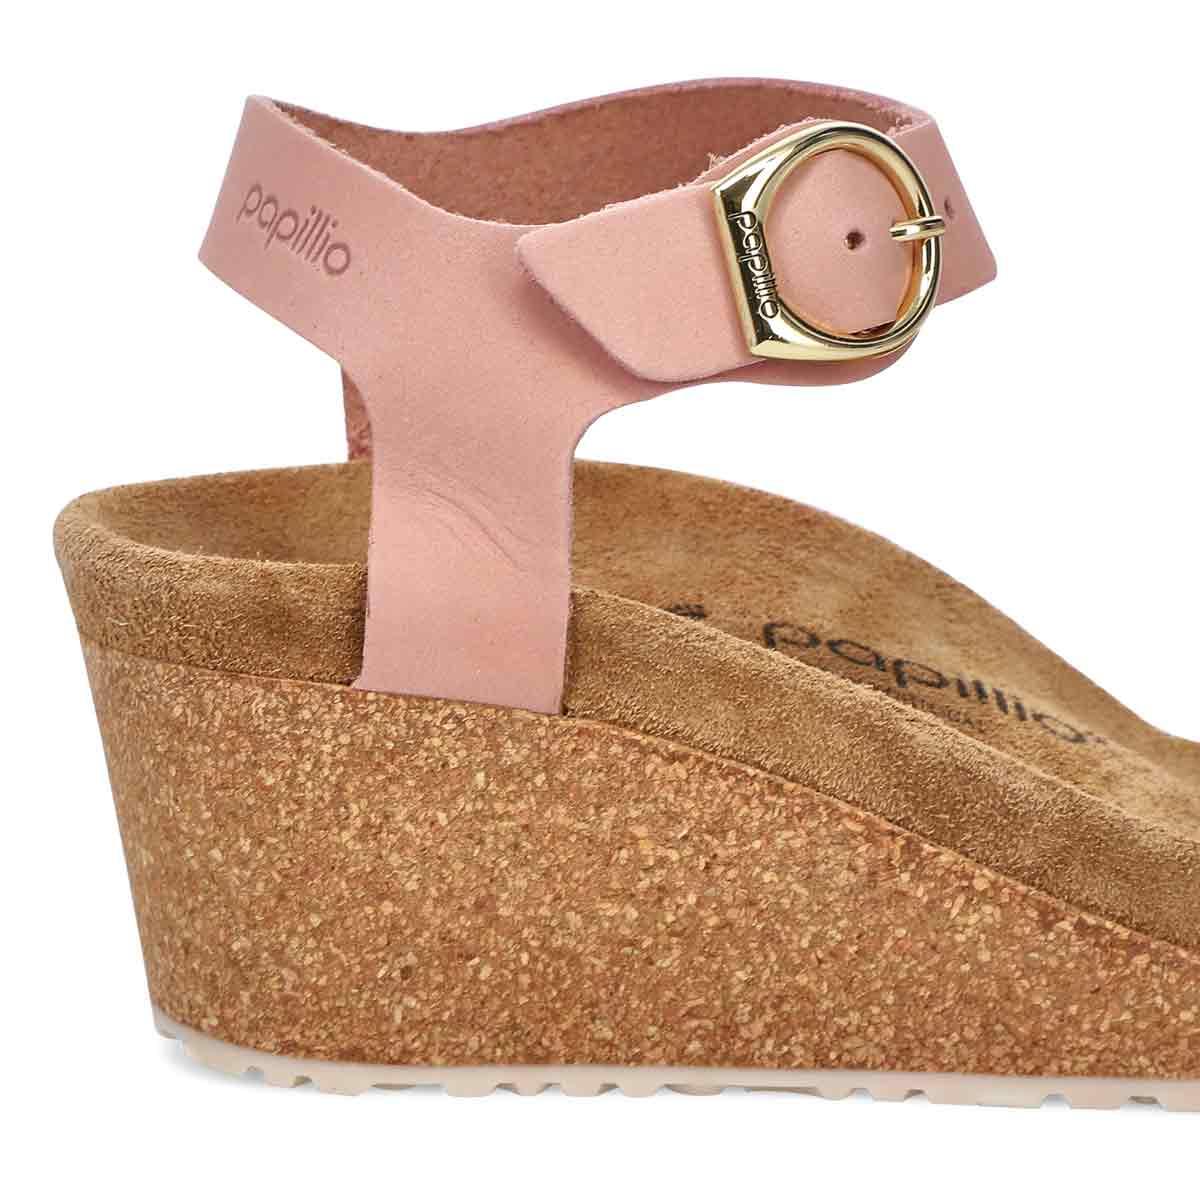 Women's Soley Narrow Sandal - Soft Pink